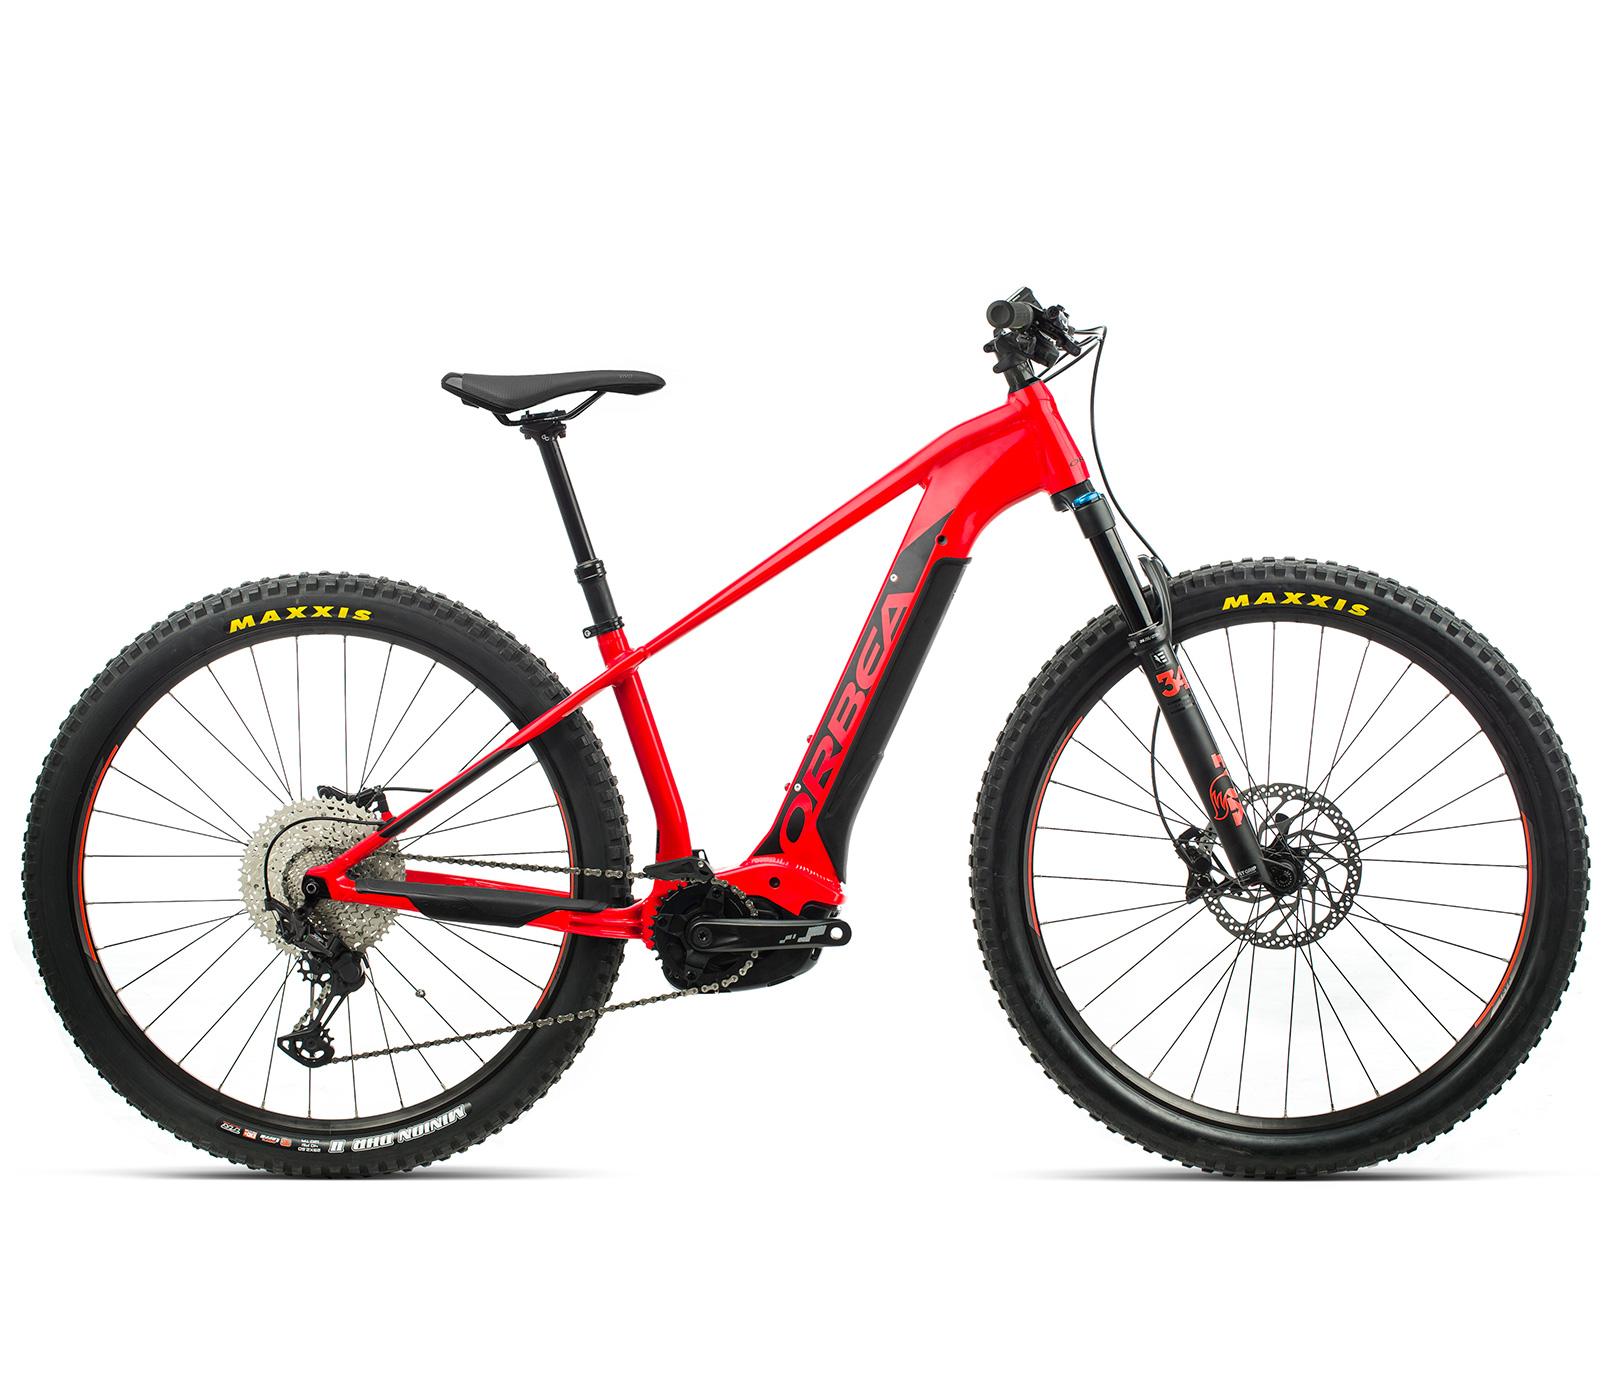 ORBEA WILD HT20 29 ebike - BRIGHT RED (GLOSS) / ZWART (DOF) @G-Bikes